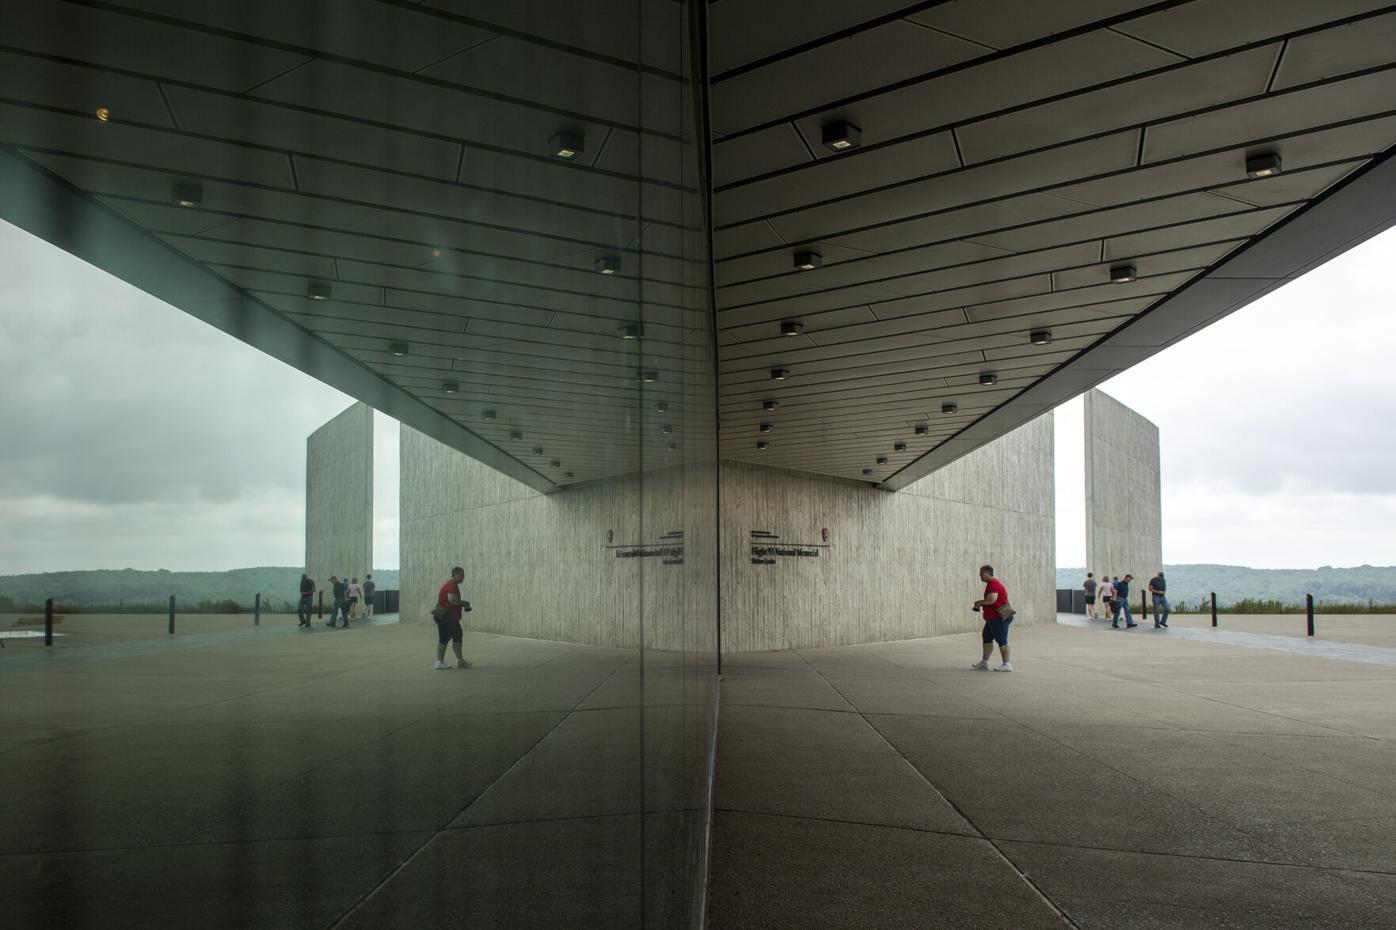 Flight 93 Memorial 20 years later